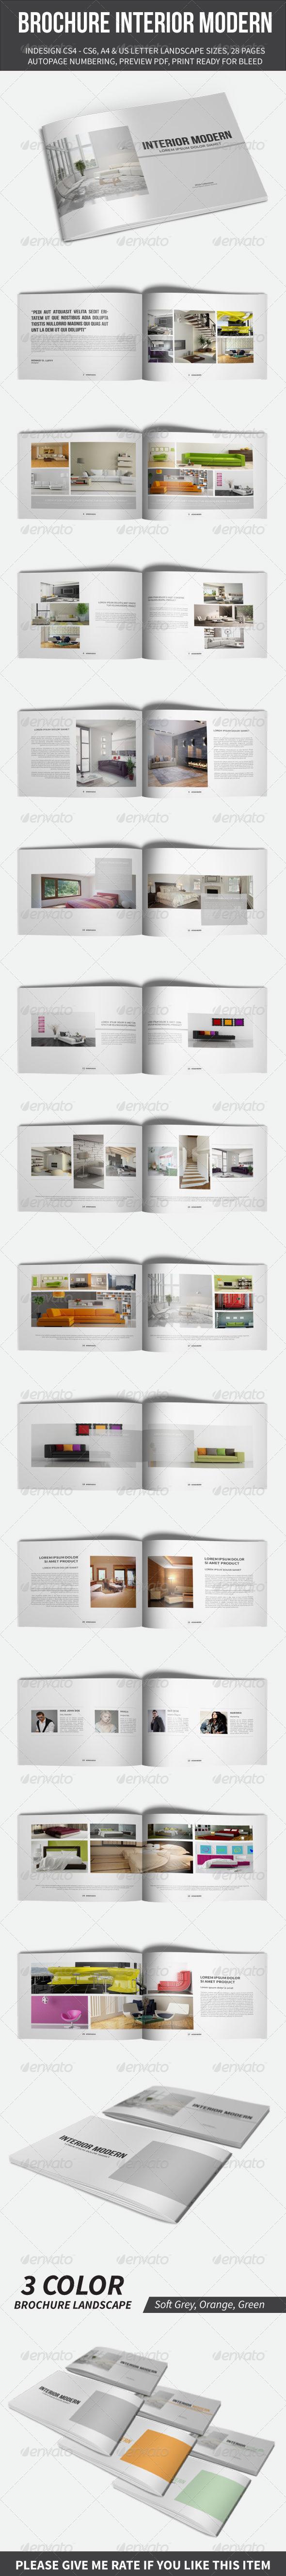 GraphicRiver Brochure Interior Modern Template 8500707